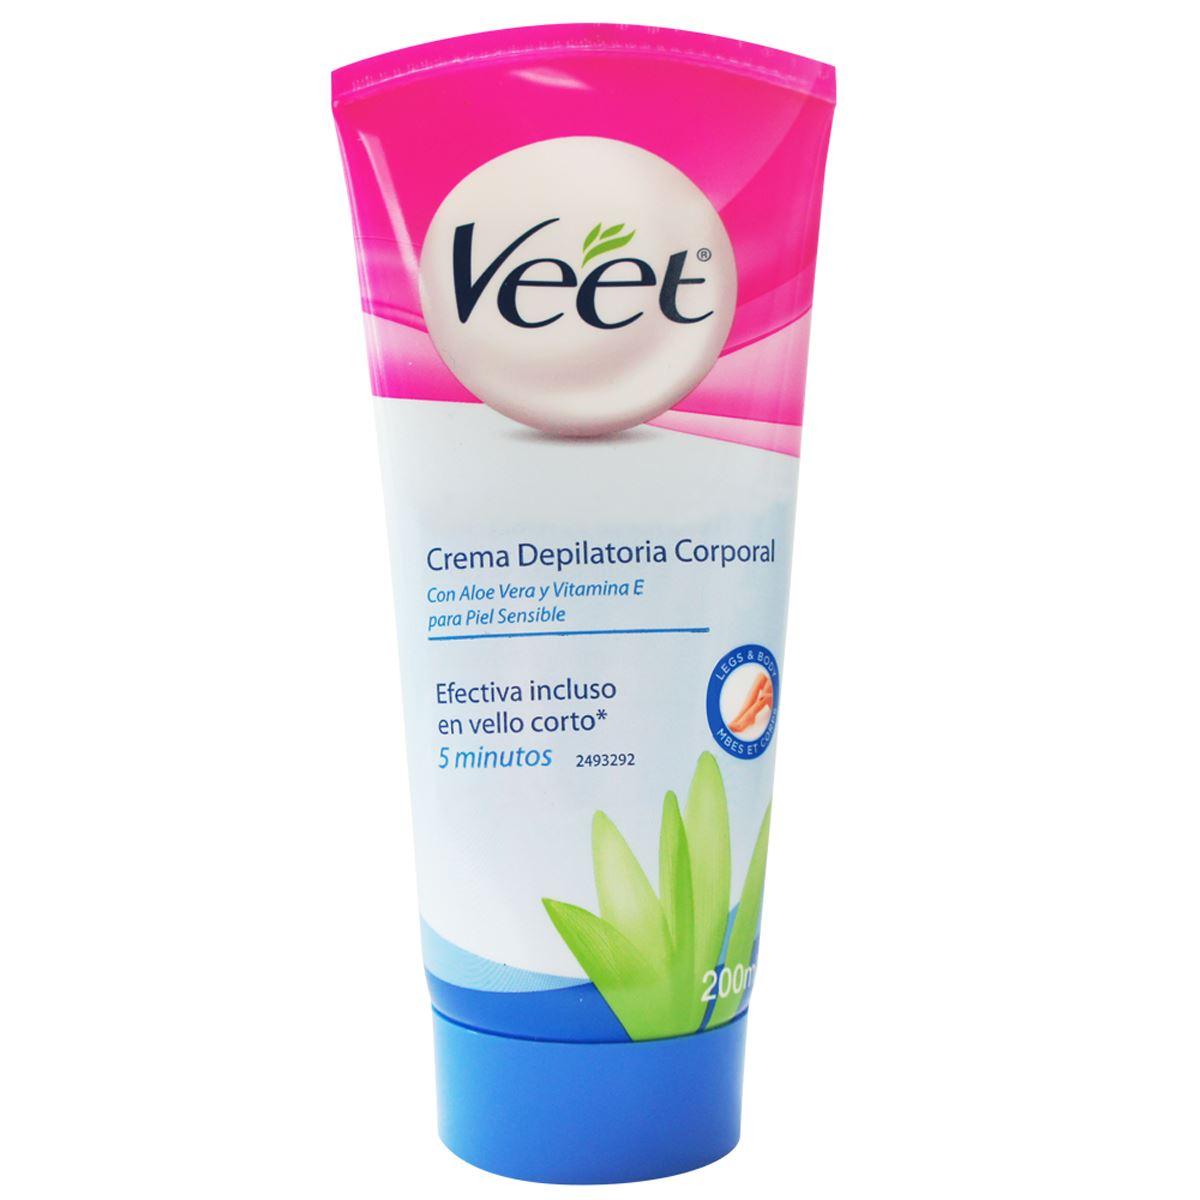 Veet® crema depilatoria corporal para piel sensible 200ml  - Sanborns